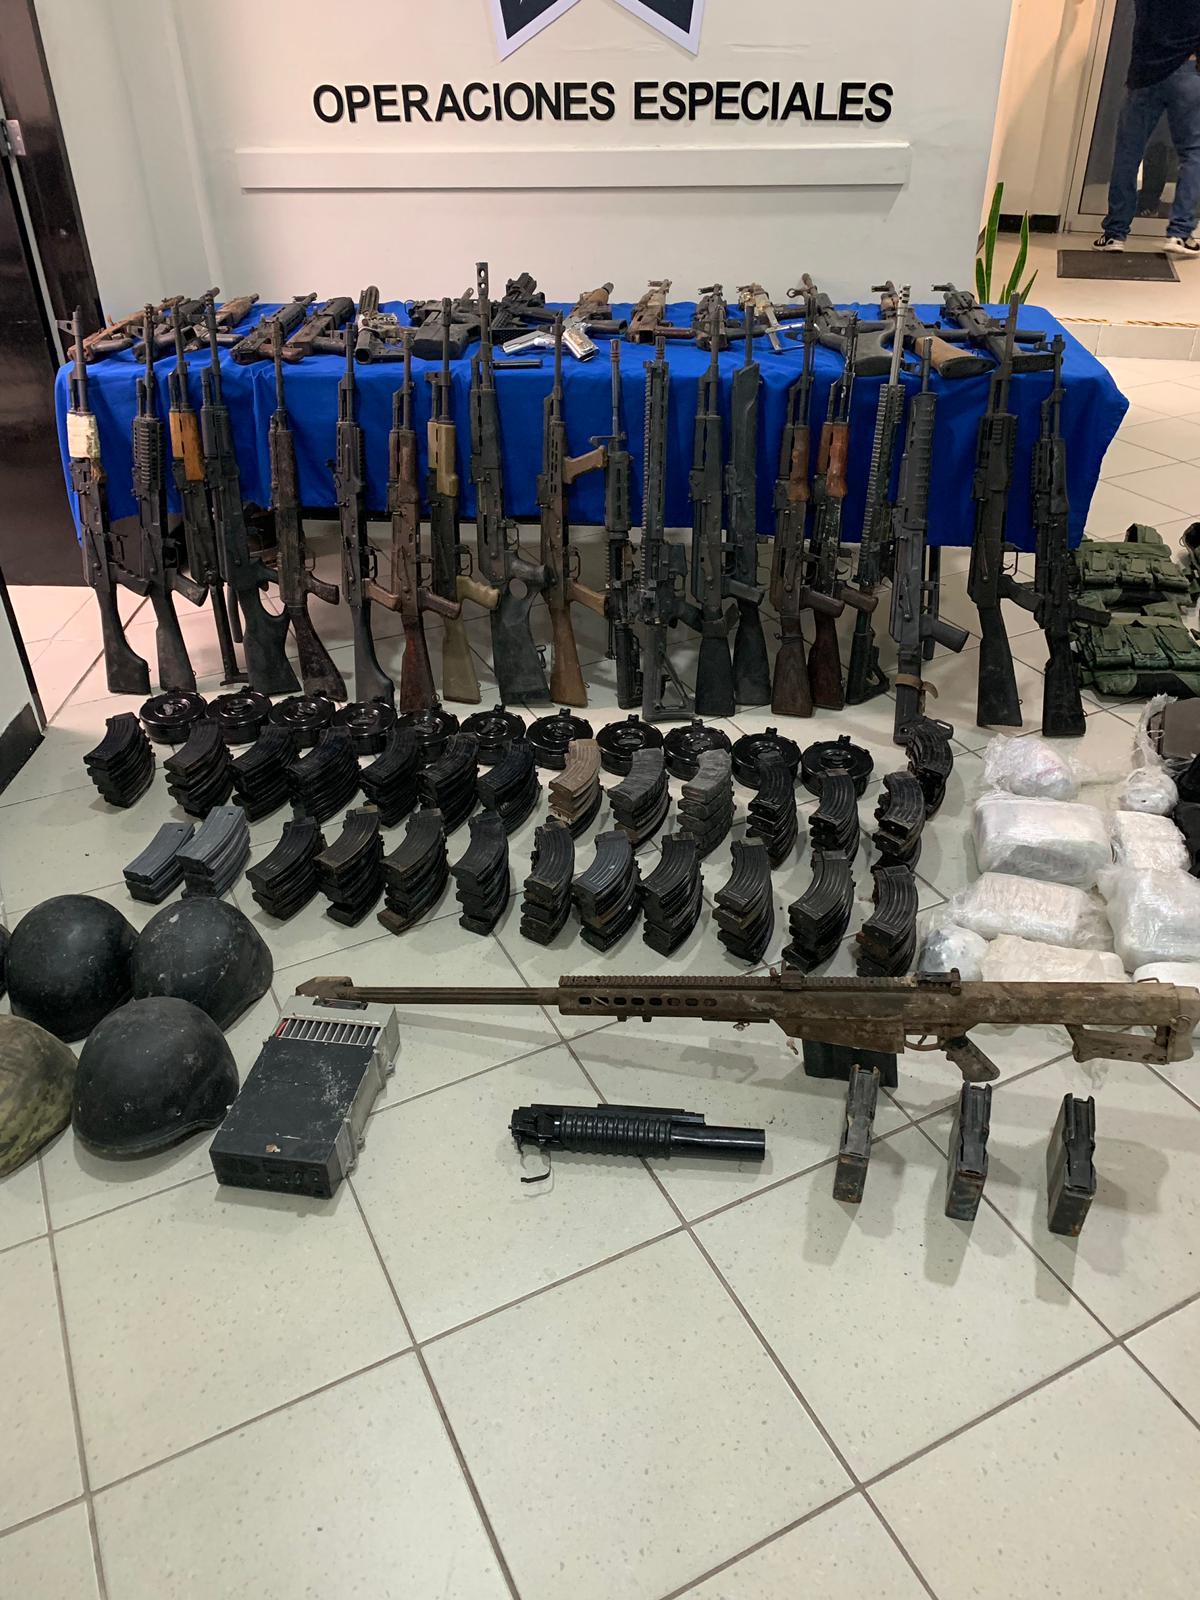 Arsenal armas decomisado Reynosa 3